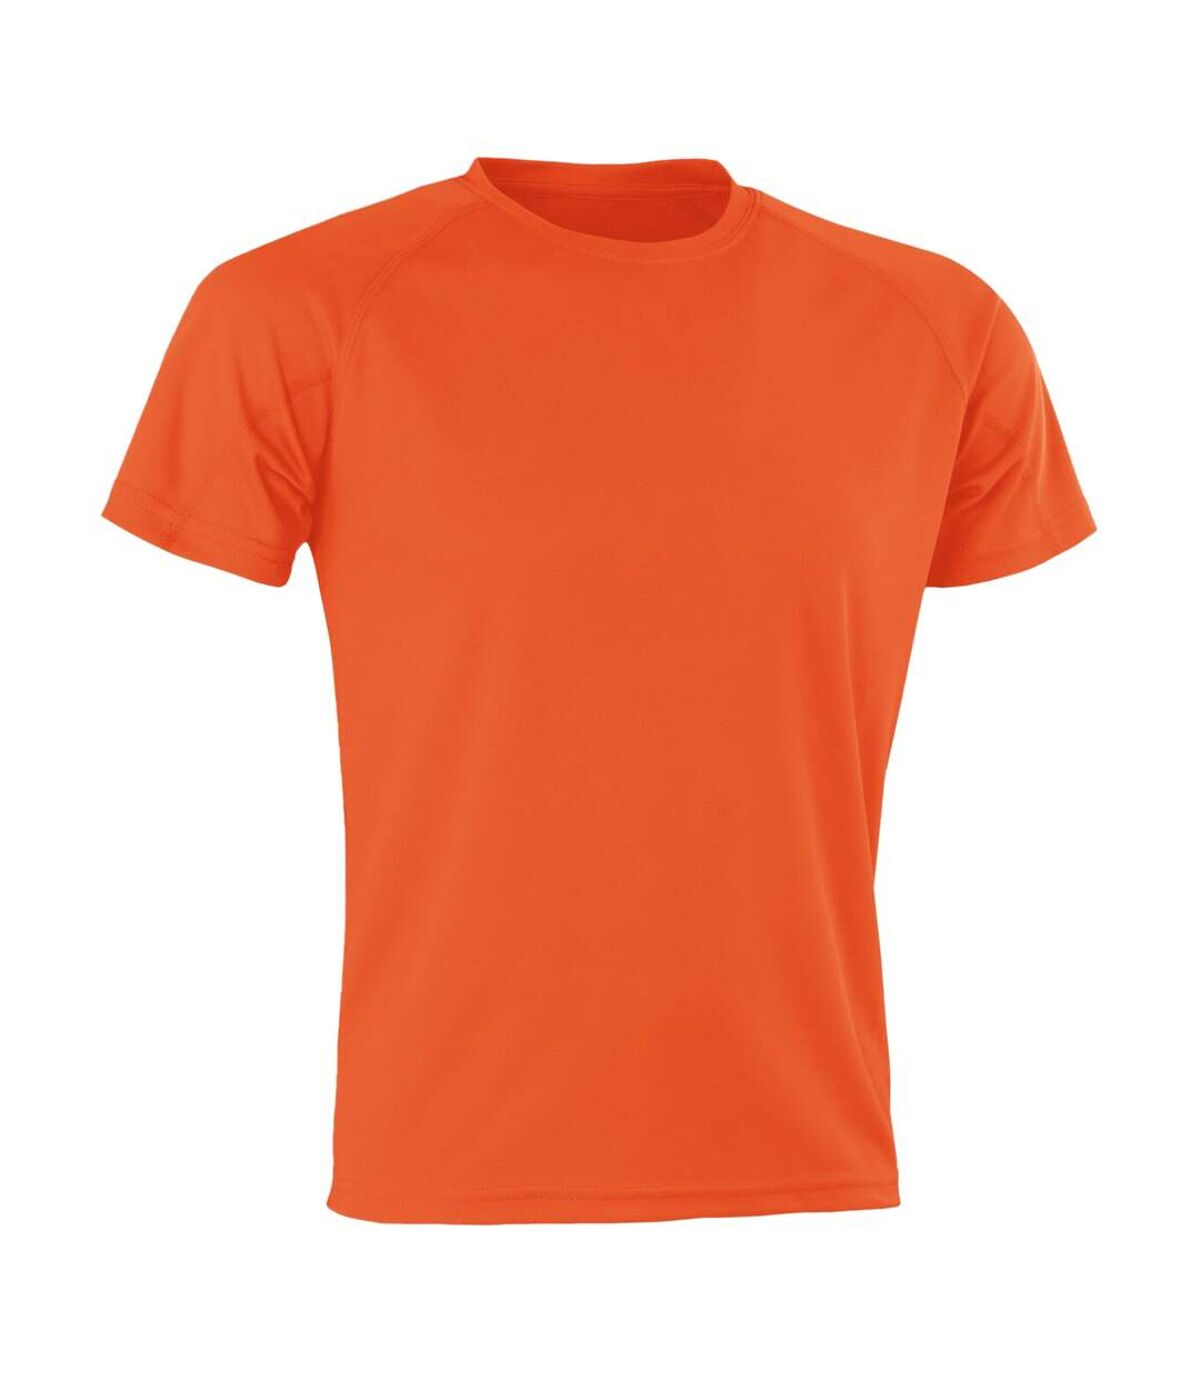 Spiro Mens Aircool T-Shirt (Orange) - UTPC3166